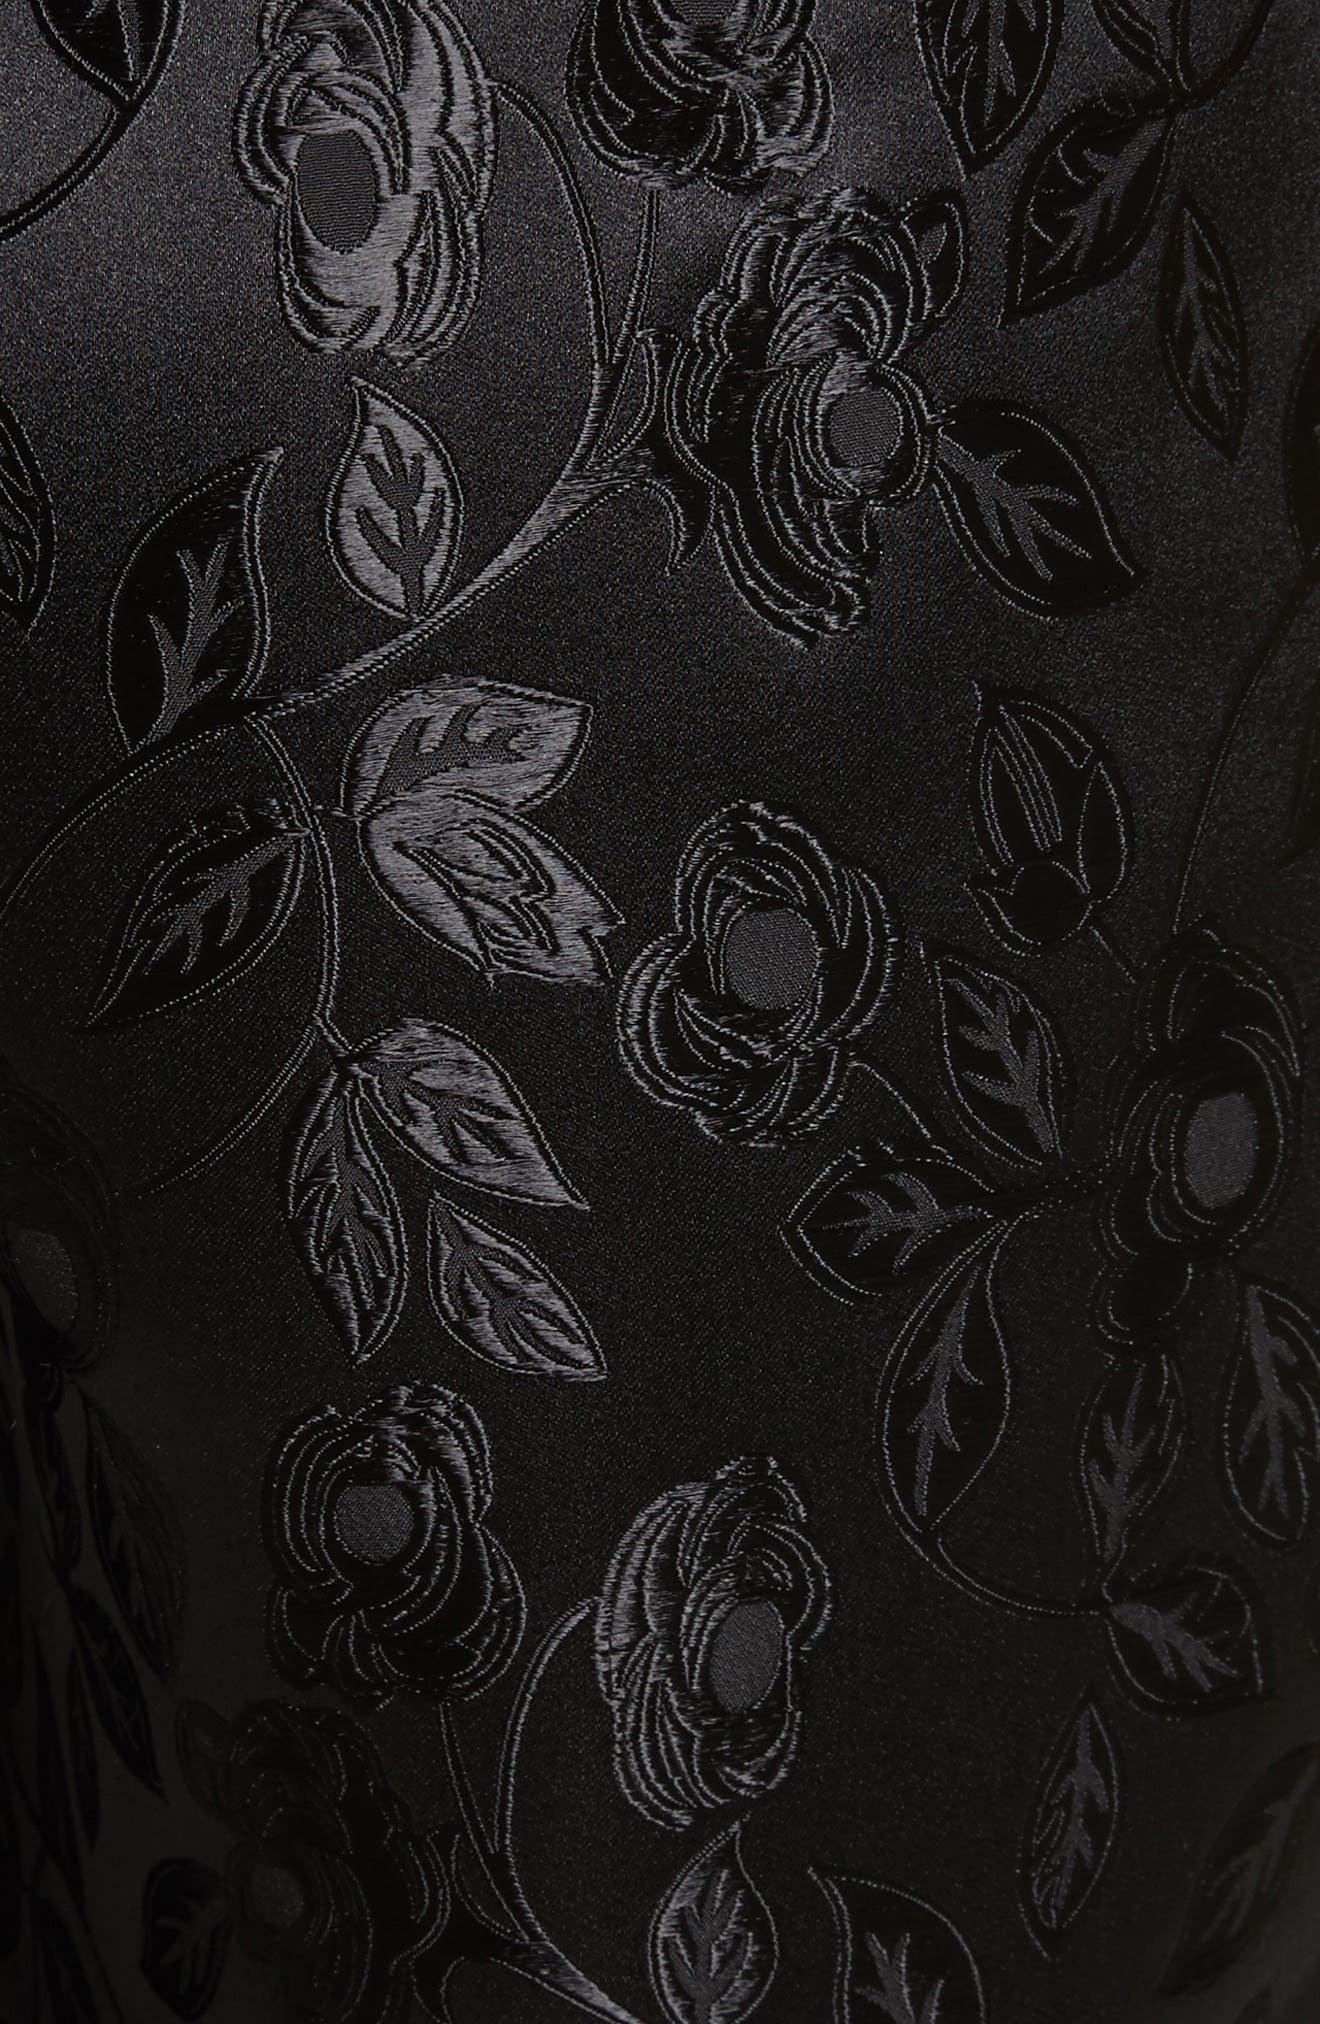 Jacquard Crop Pants,                             Alternate thumbnail 6, color,                             Black